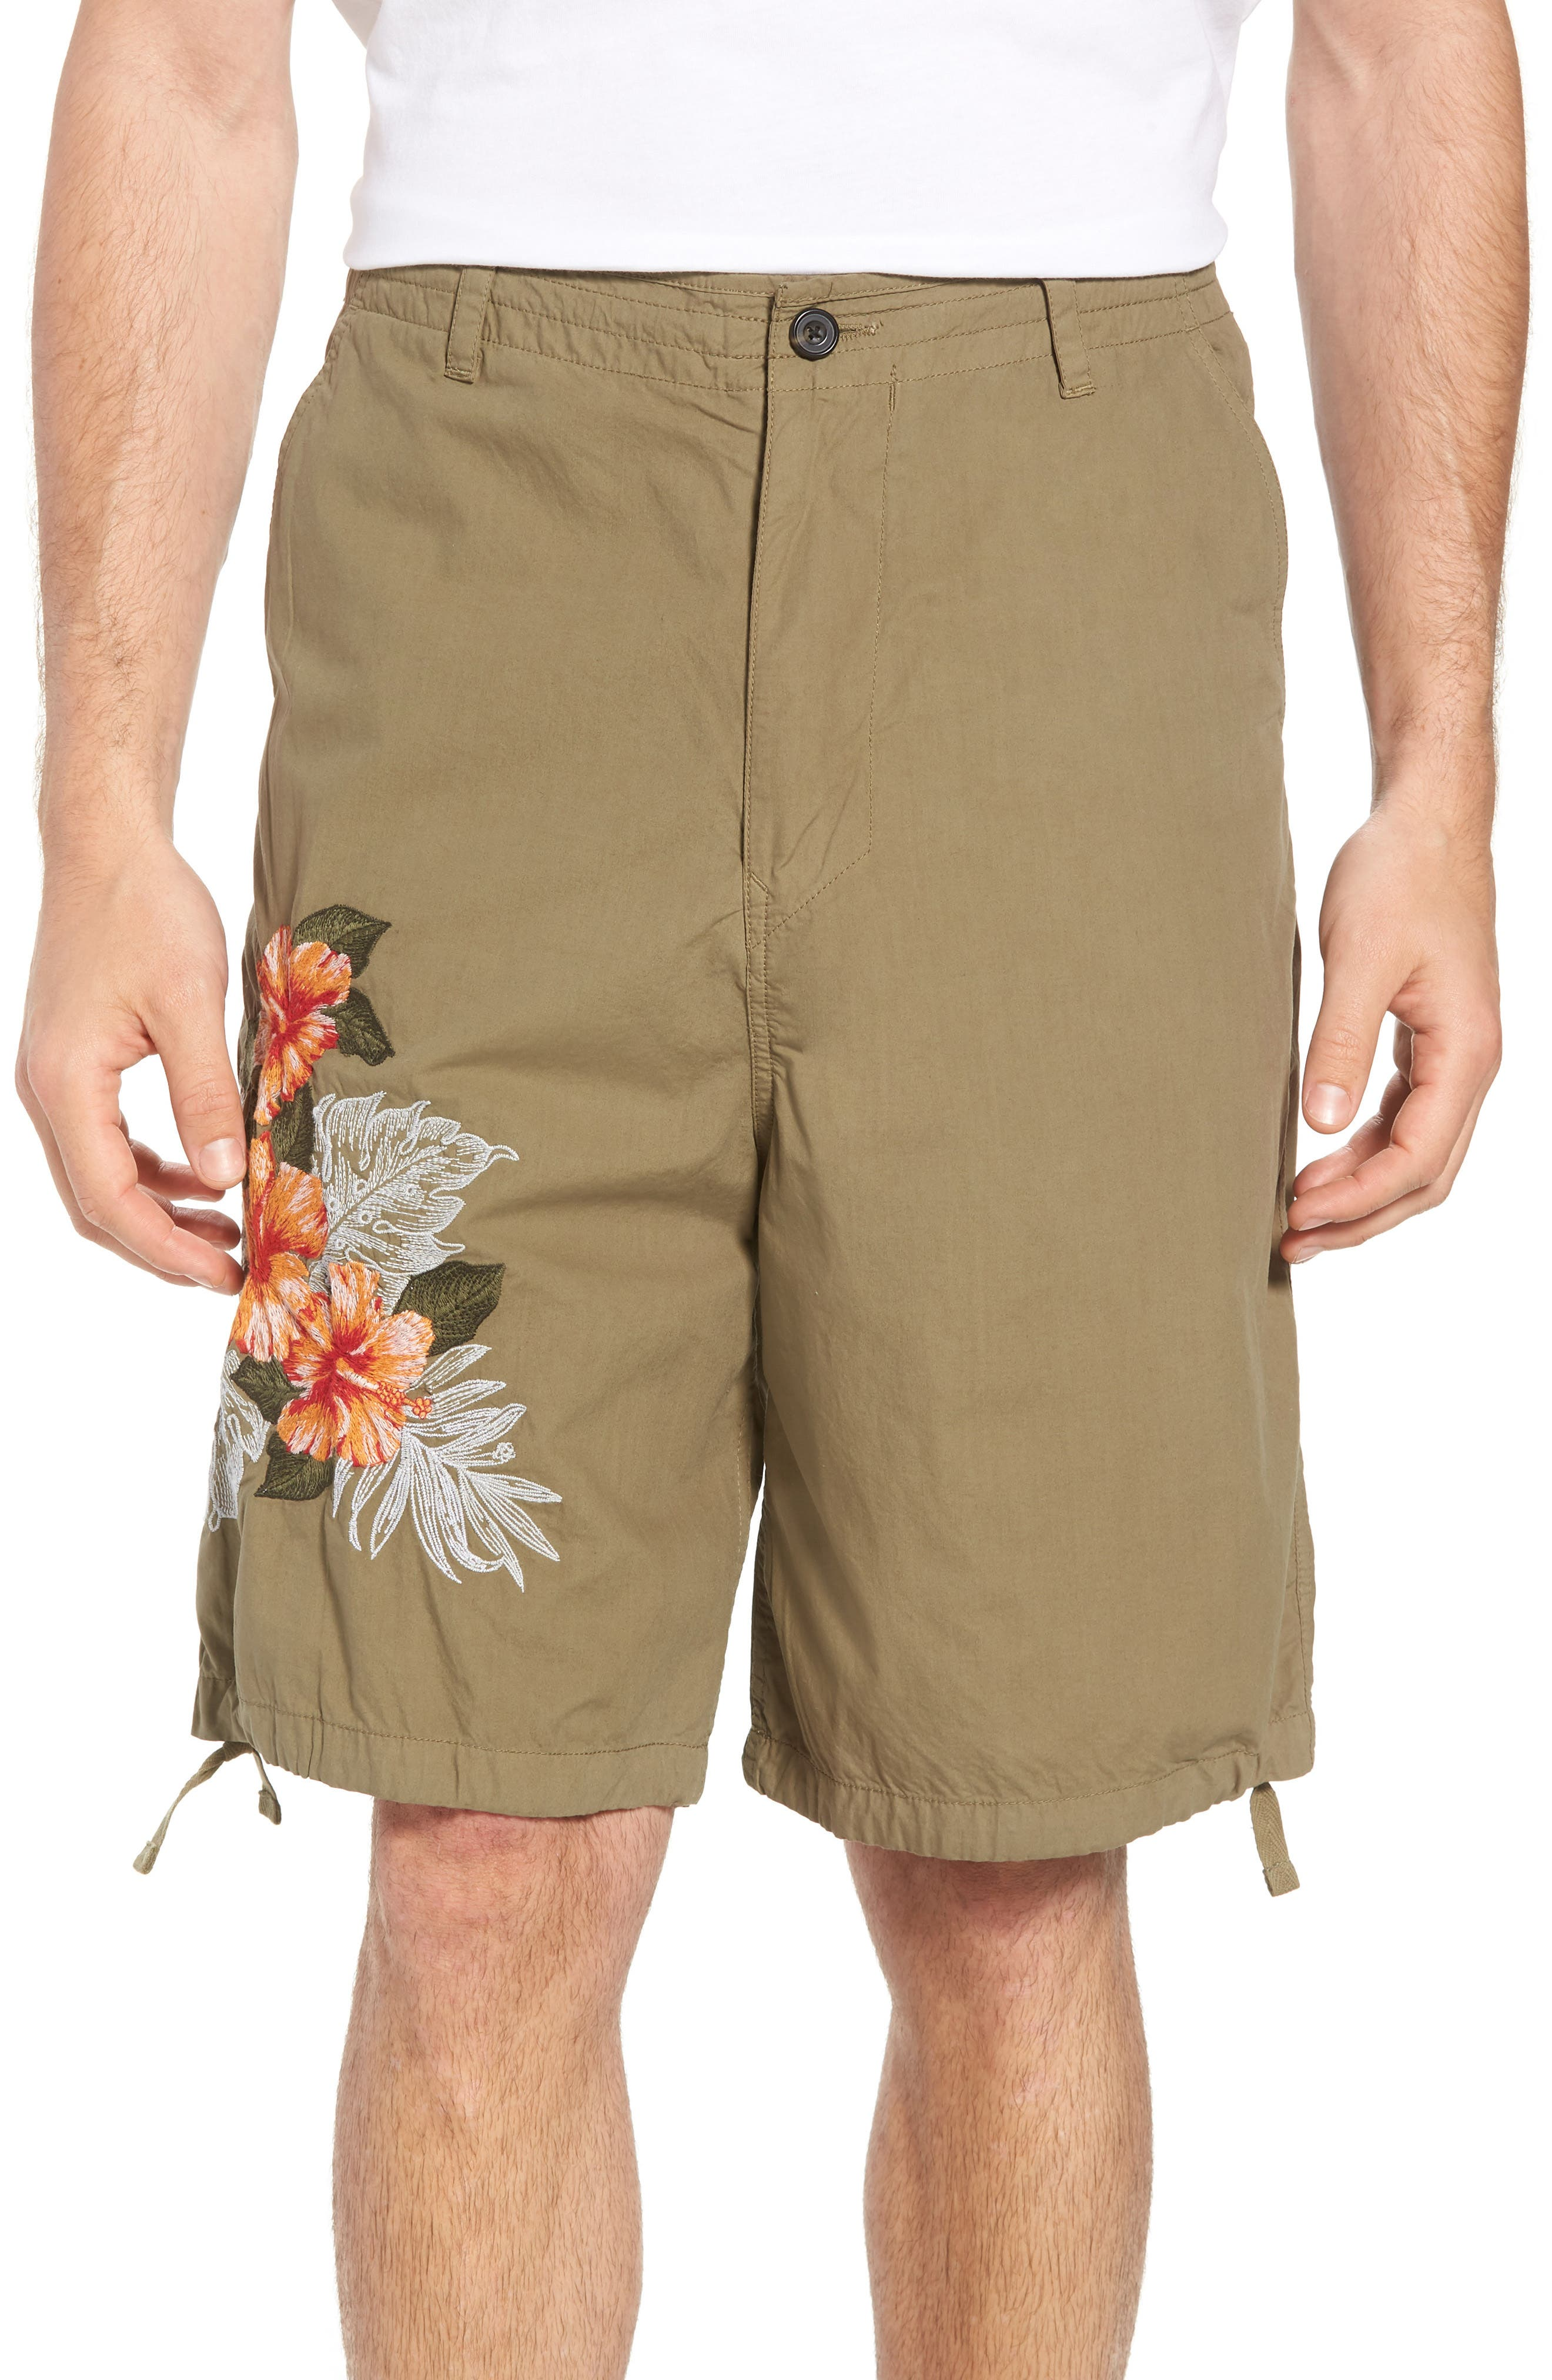 Embroidered Poplin Shorts,                             Main thumbnail 1, color,                             301